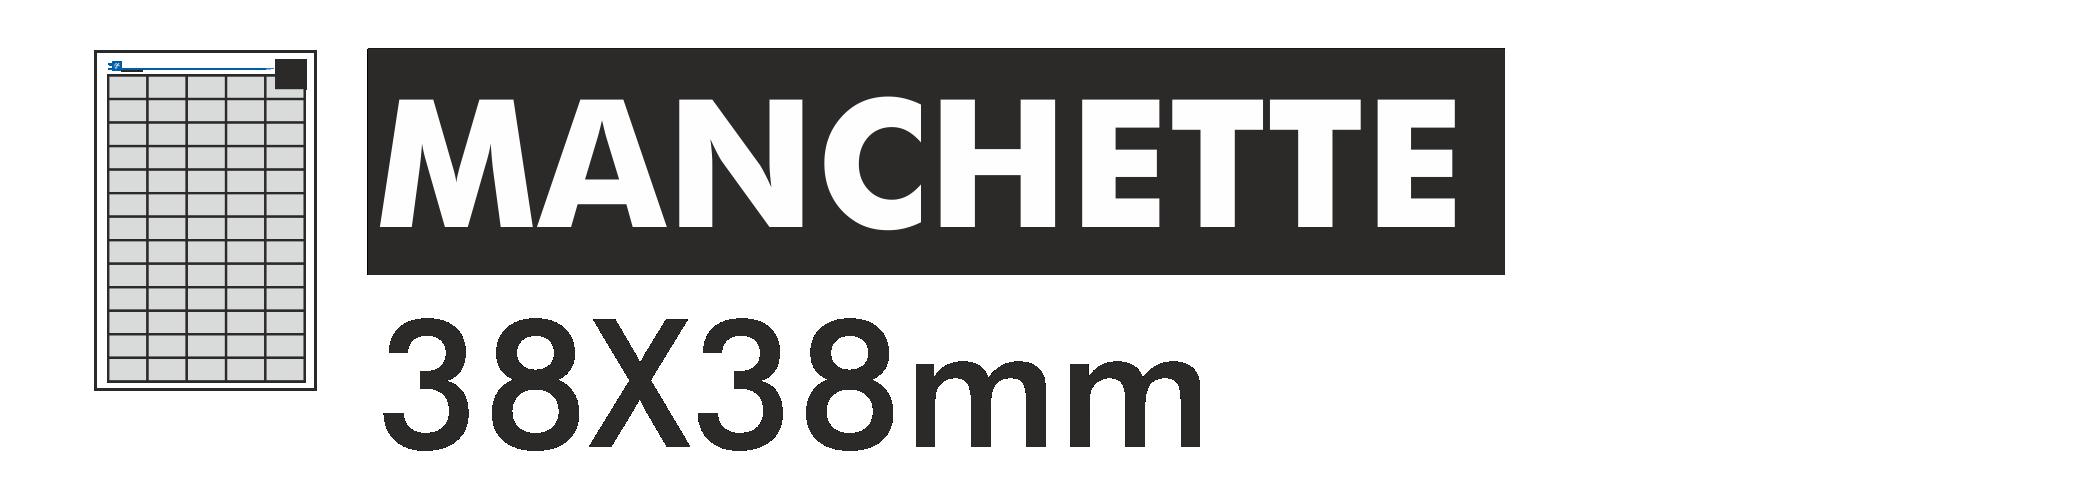 Manchette